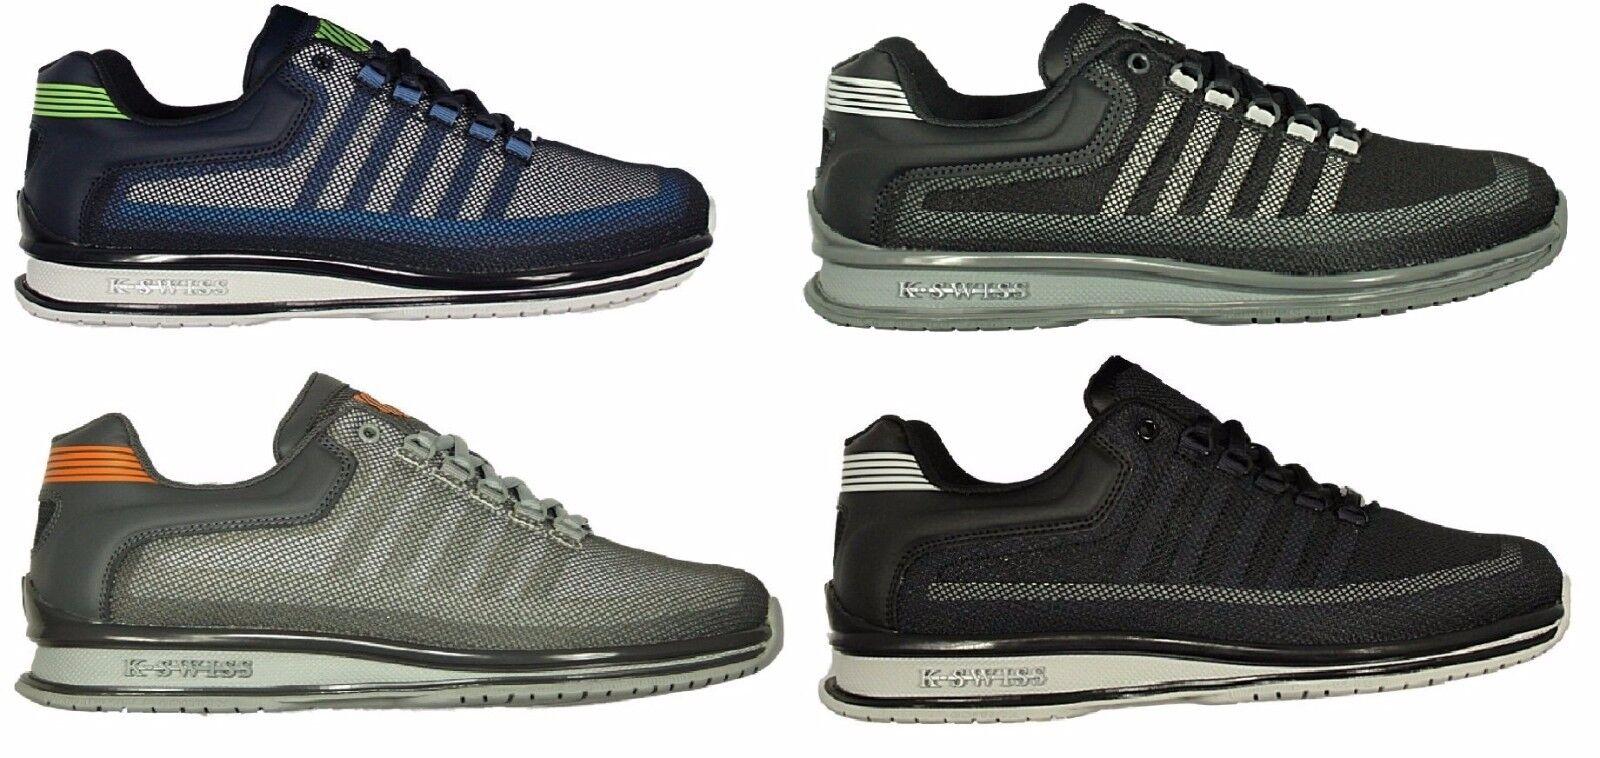 Totalmente nuevo para hombre K. SWISS RINZLER Con Cordones Zapatillas Calzado en Negro gris Azul Marino